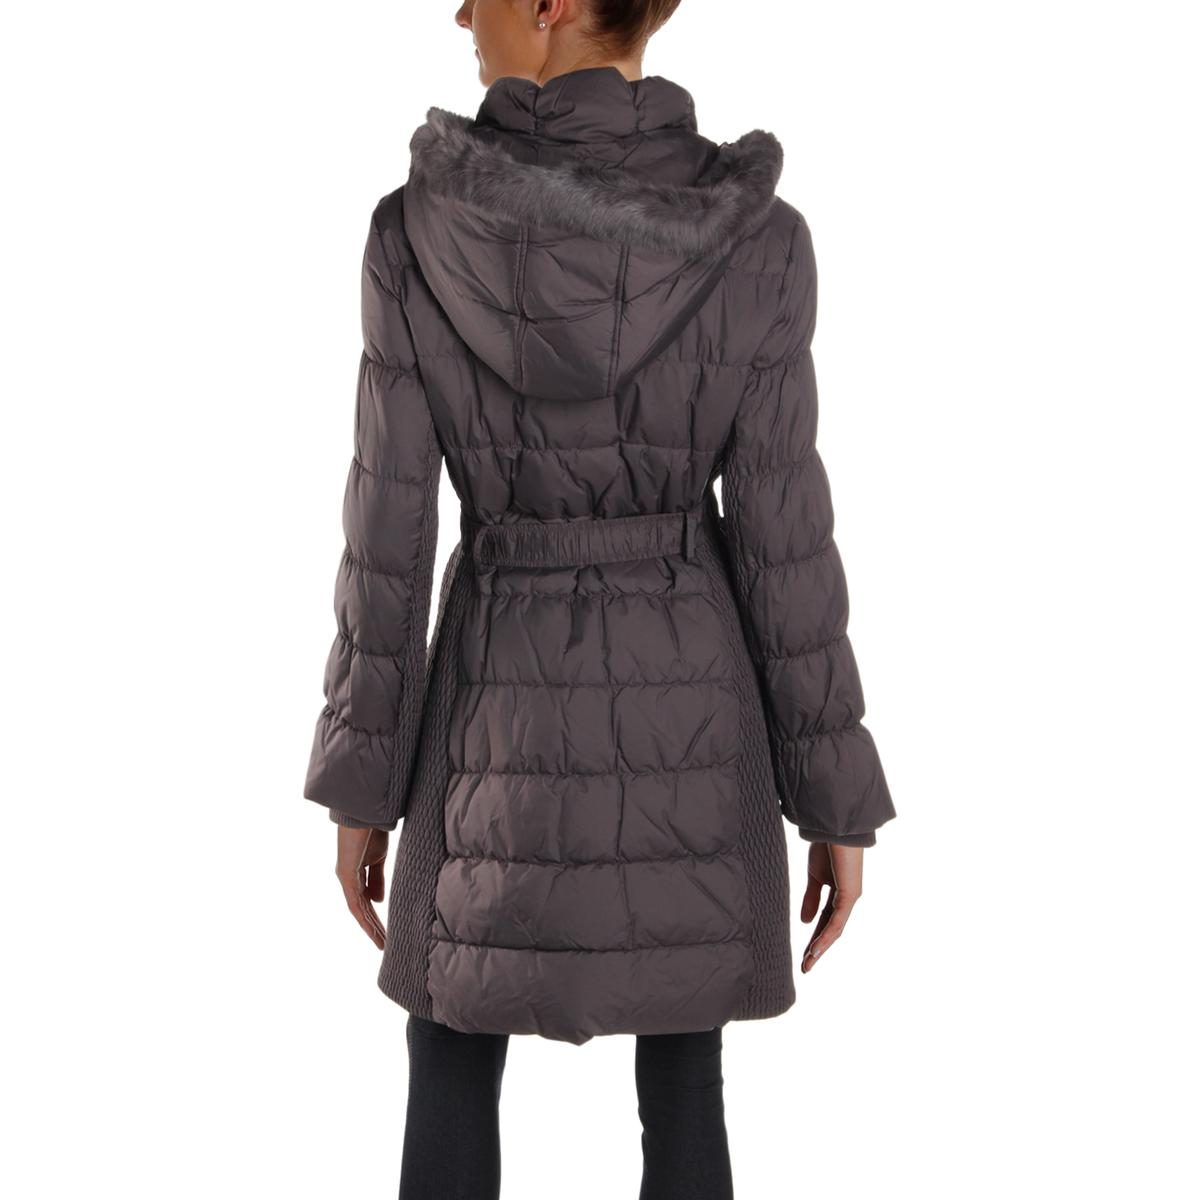 Via-Spiga-Womens-Winter-Down-Rabbit-Fur-Parka-Coat-Outerwear-BHFO-0865 thumbnail 6